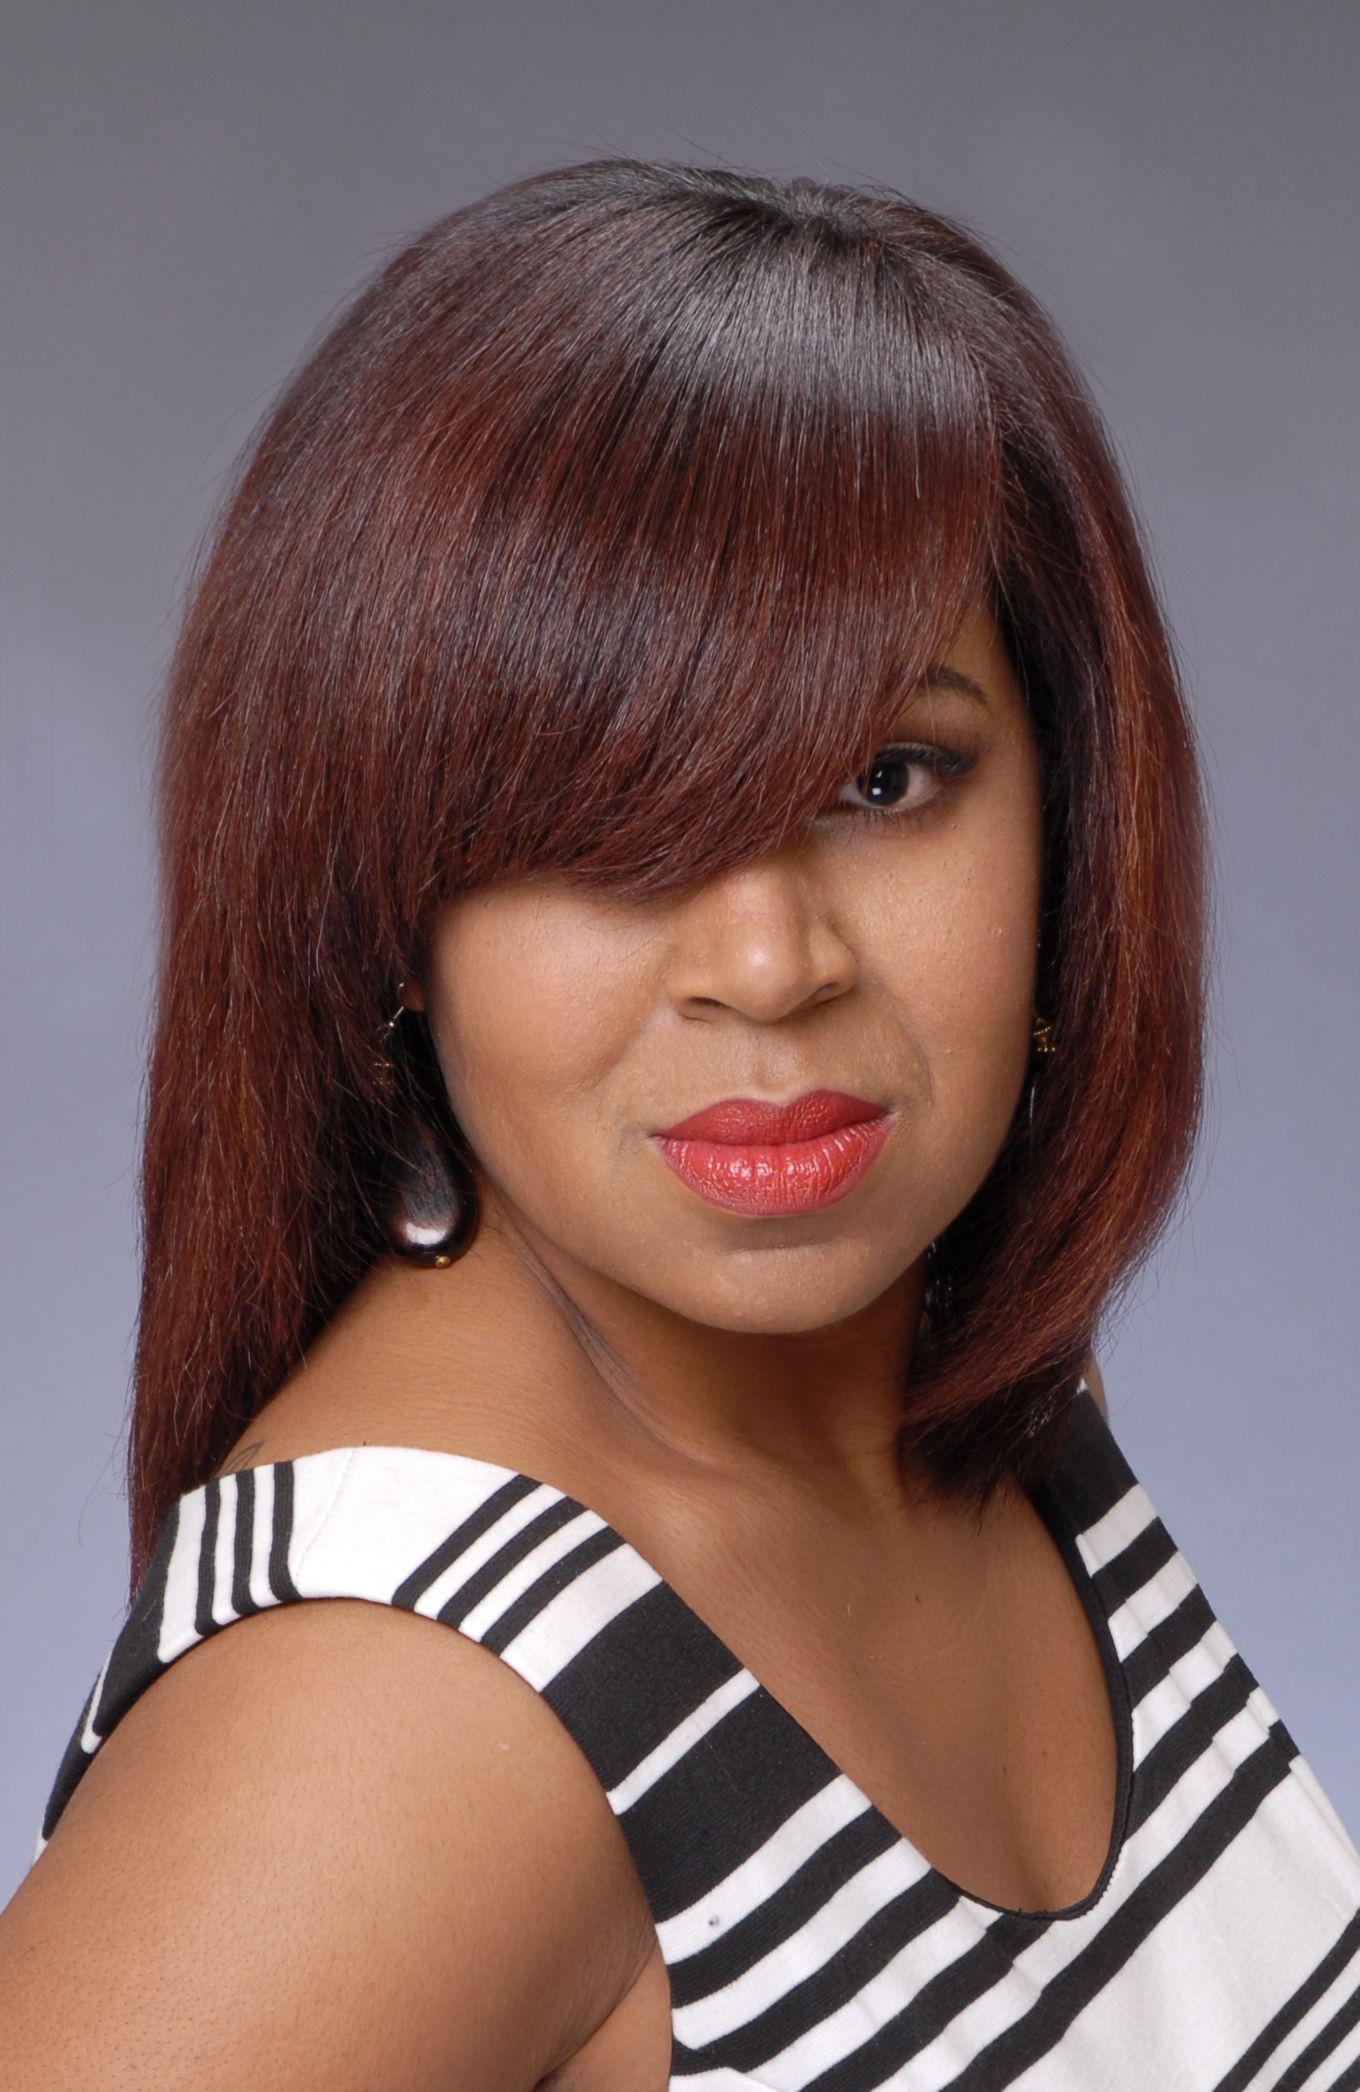 This is Michelle Savwoir whom is a stylist inside Salon